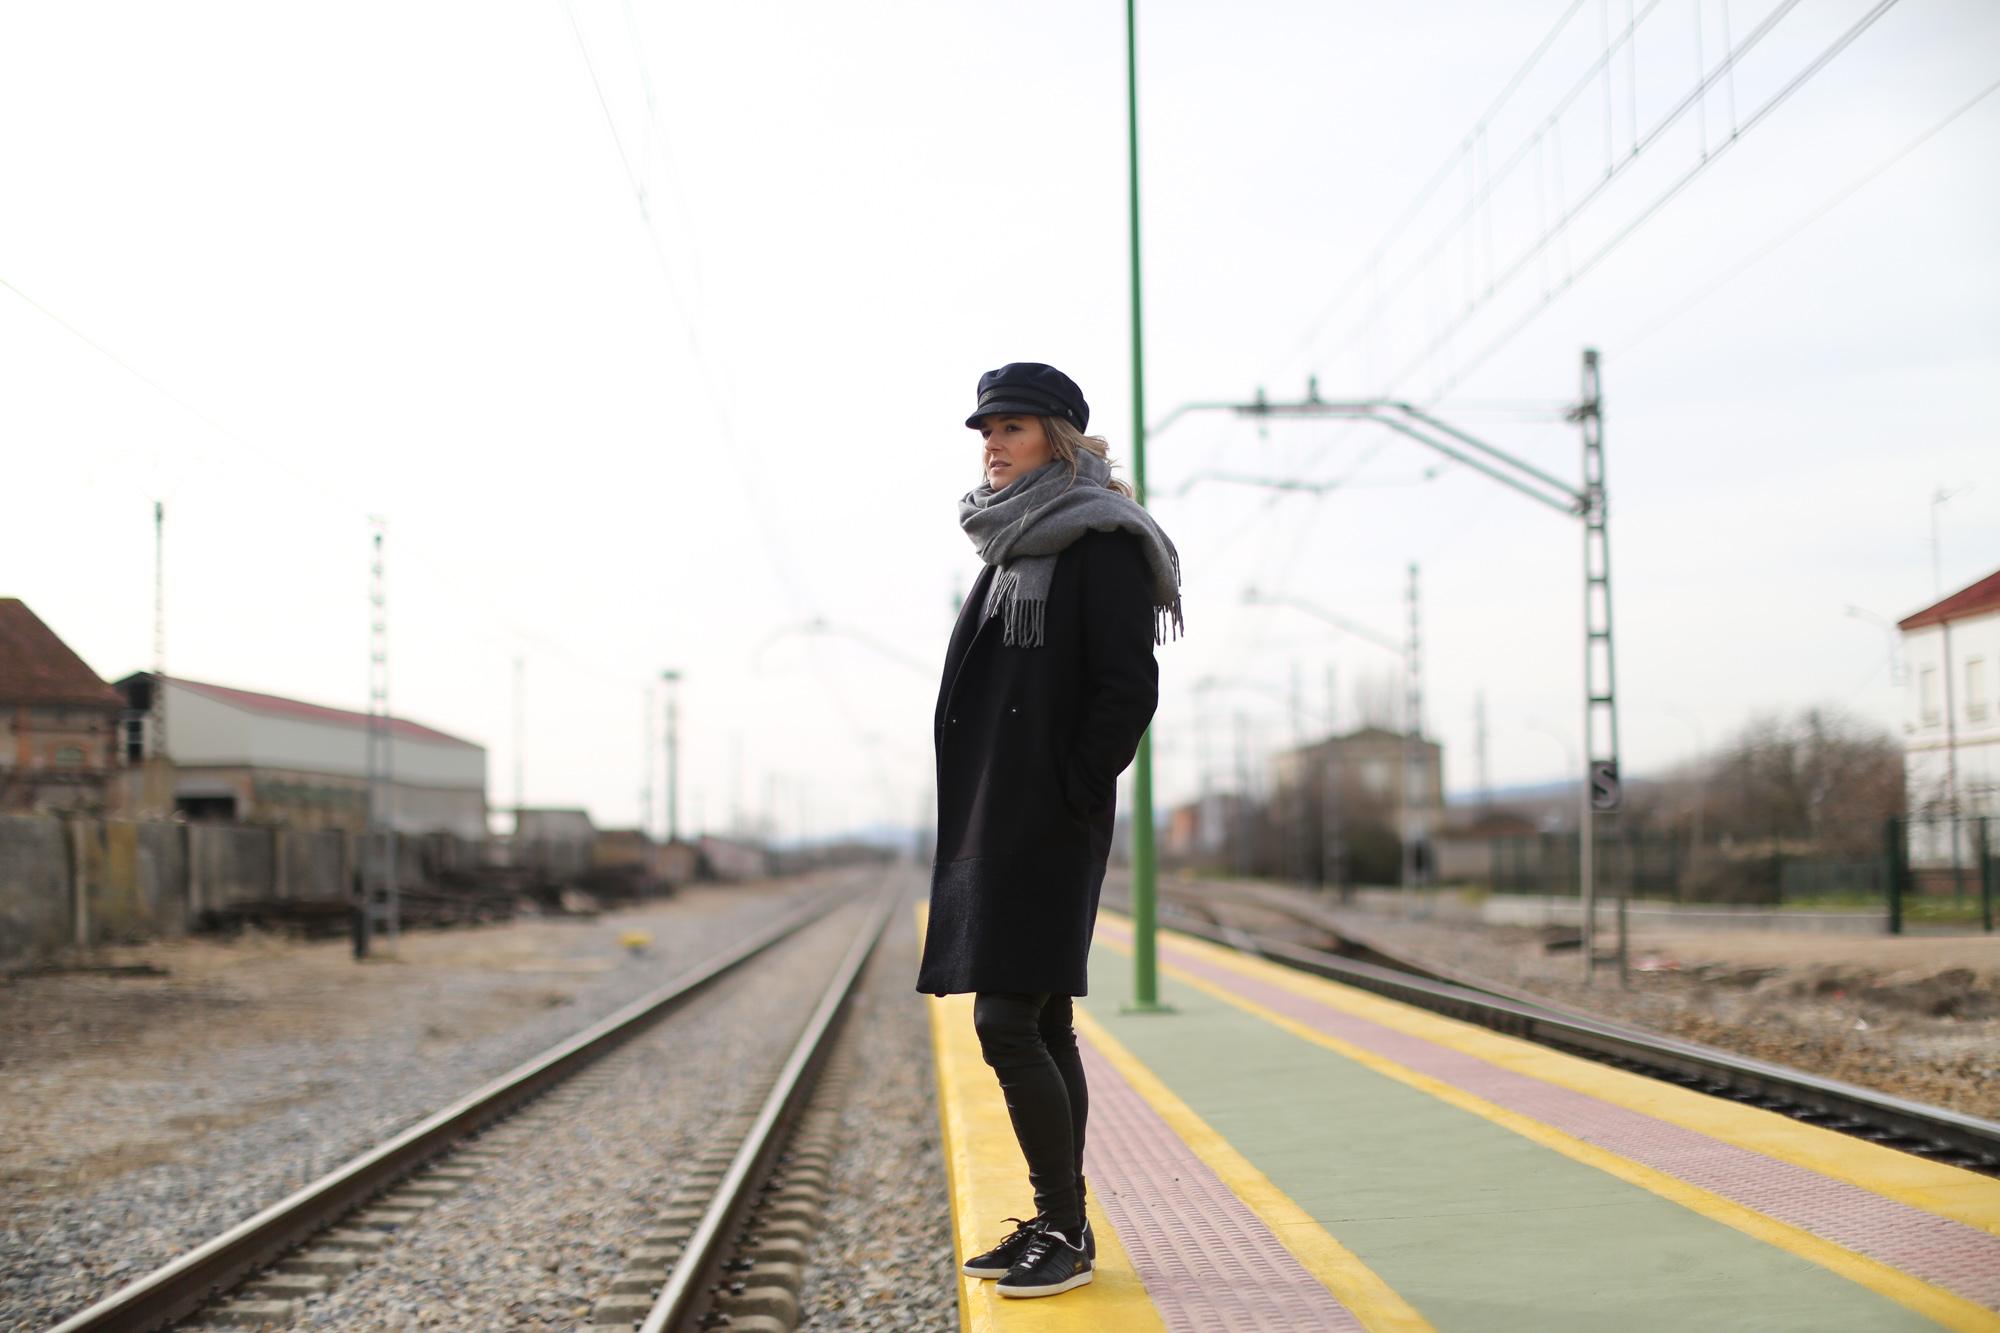 Clochet_streetstyle_cos_coat_saint_james_hat_adidas_gazelle-1